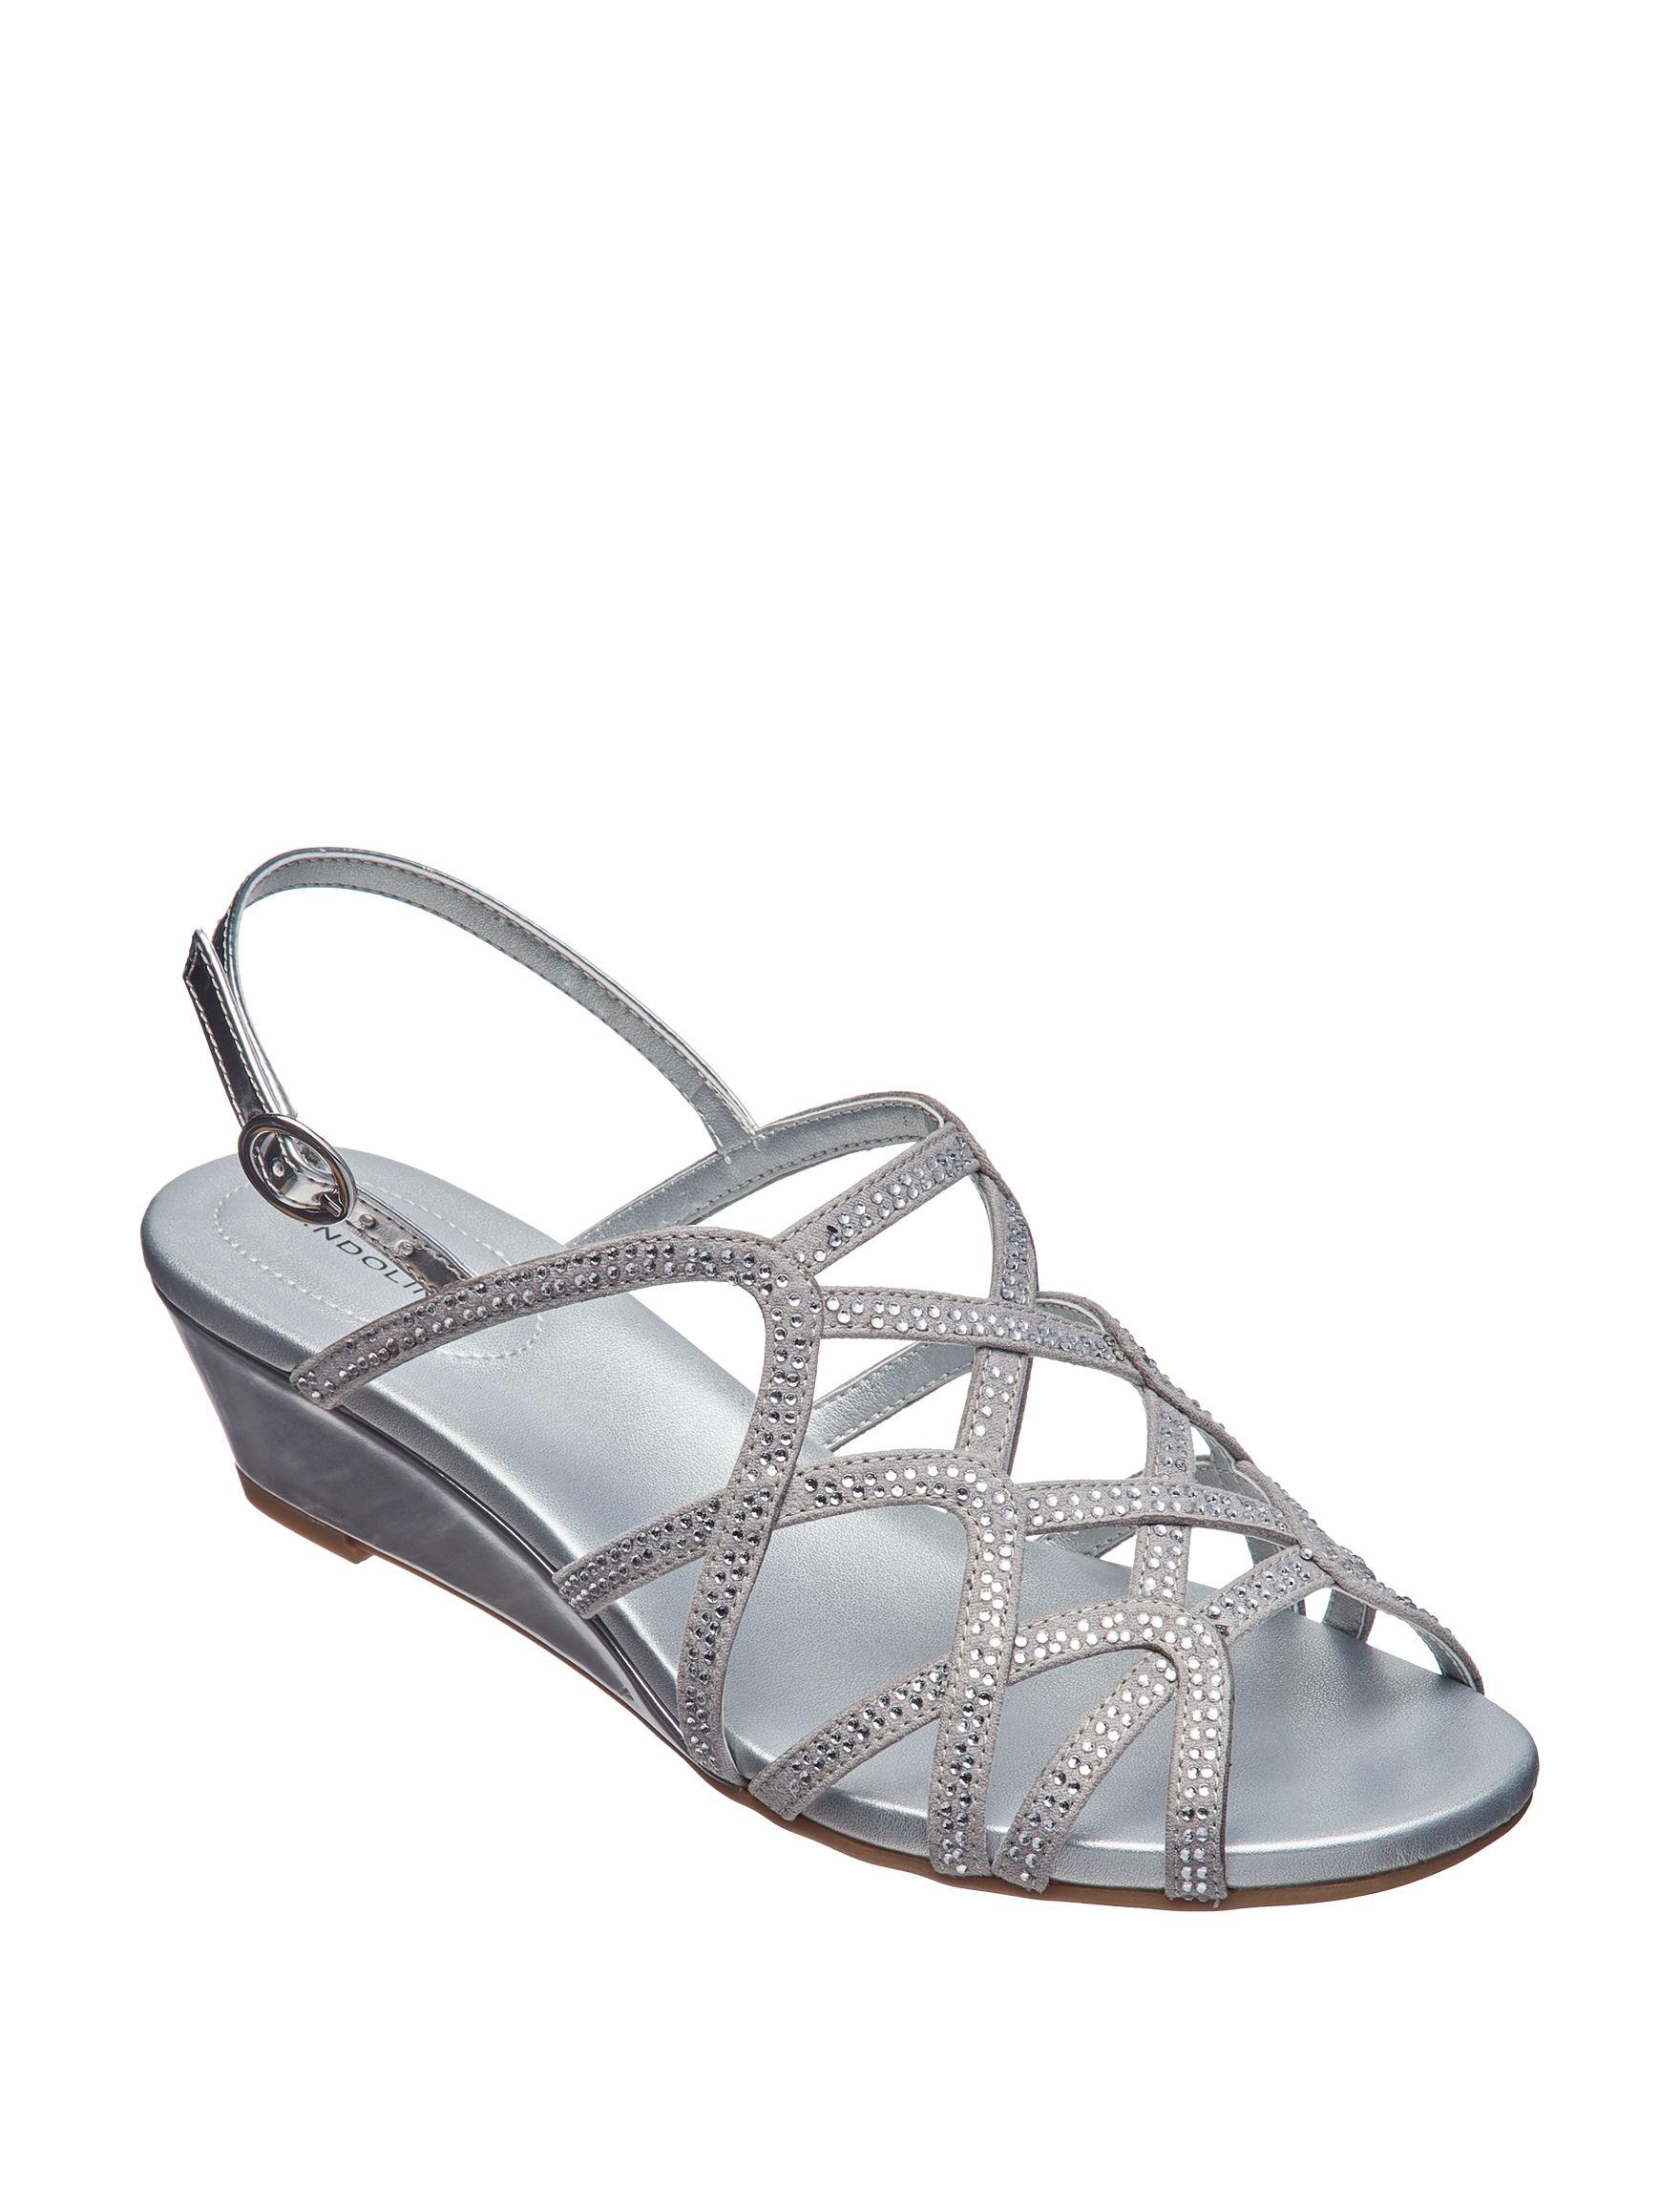 Bandolino Silver Wedge Sandals